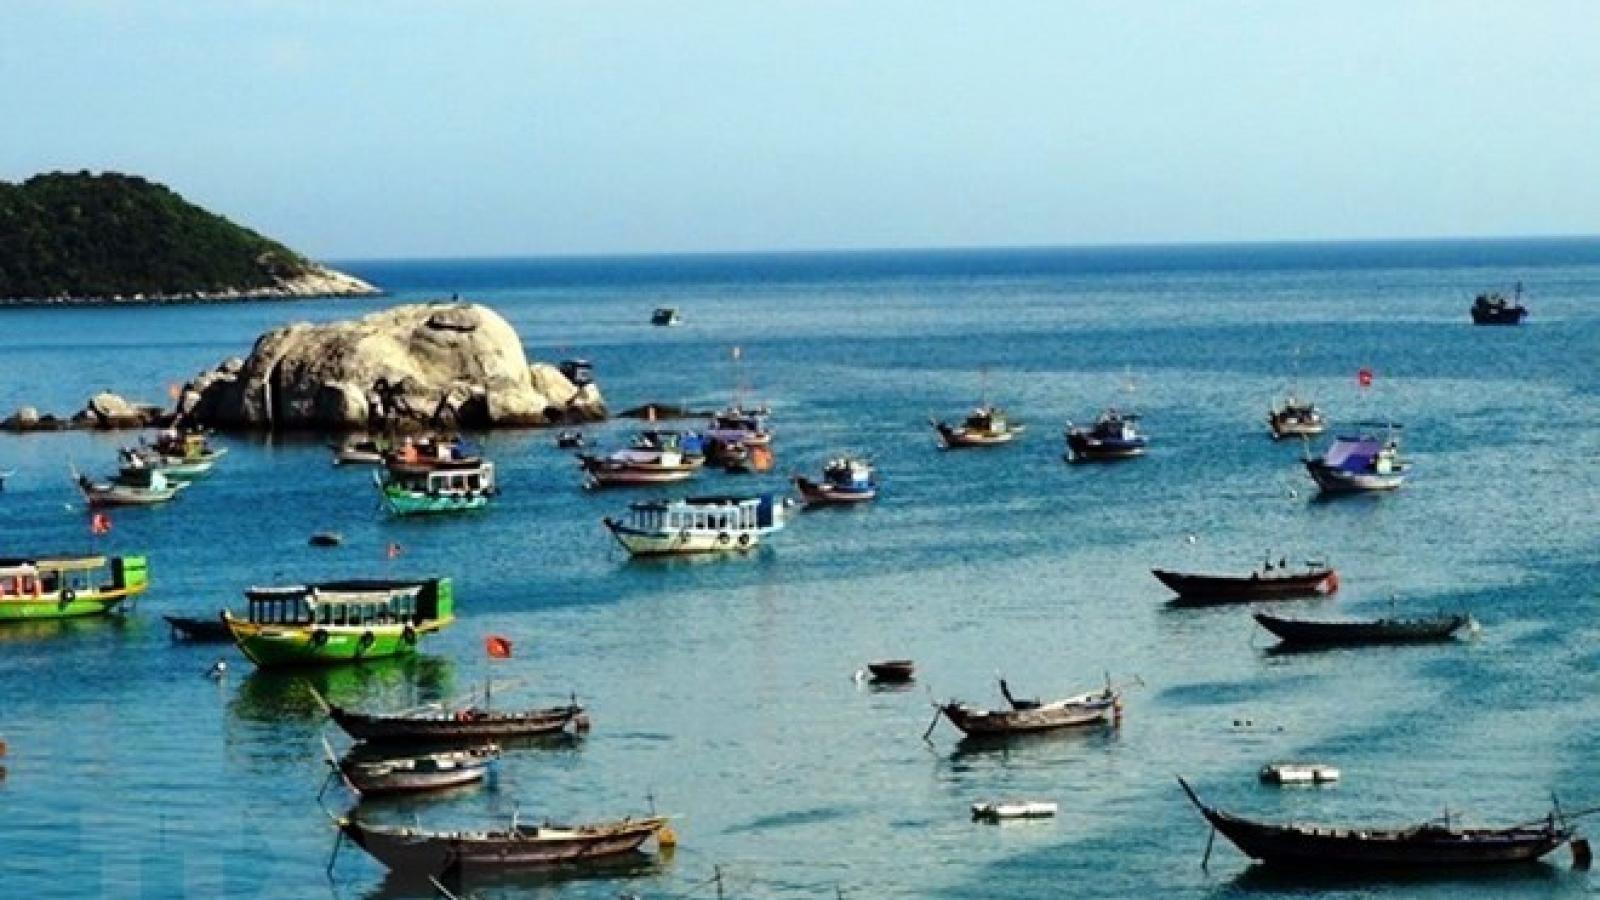 Seas, islands week 2018 to take place in Quang Ninh